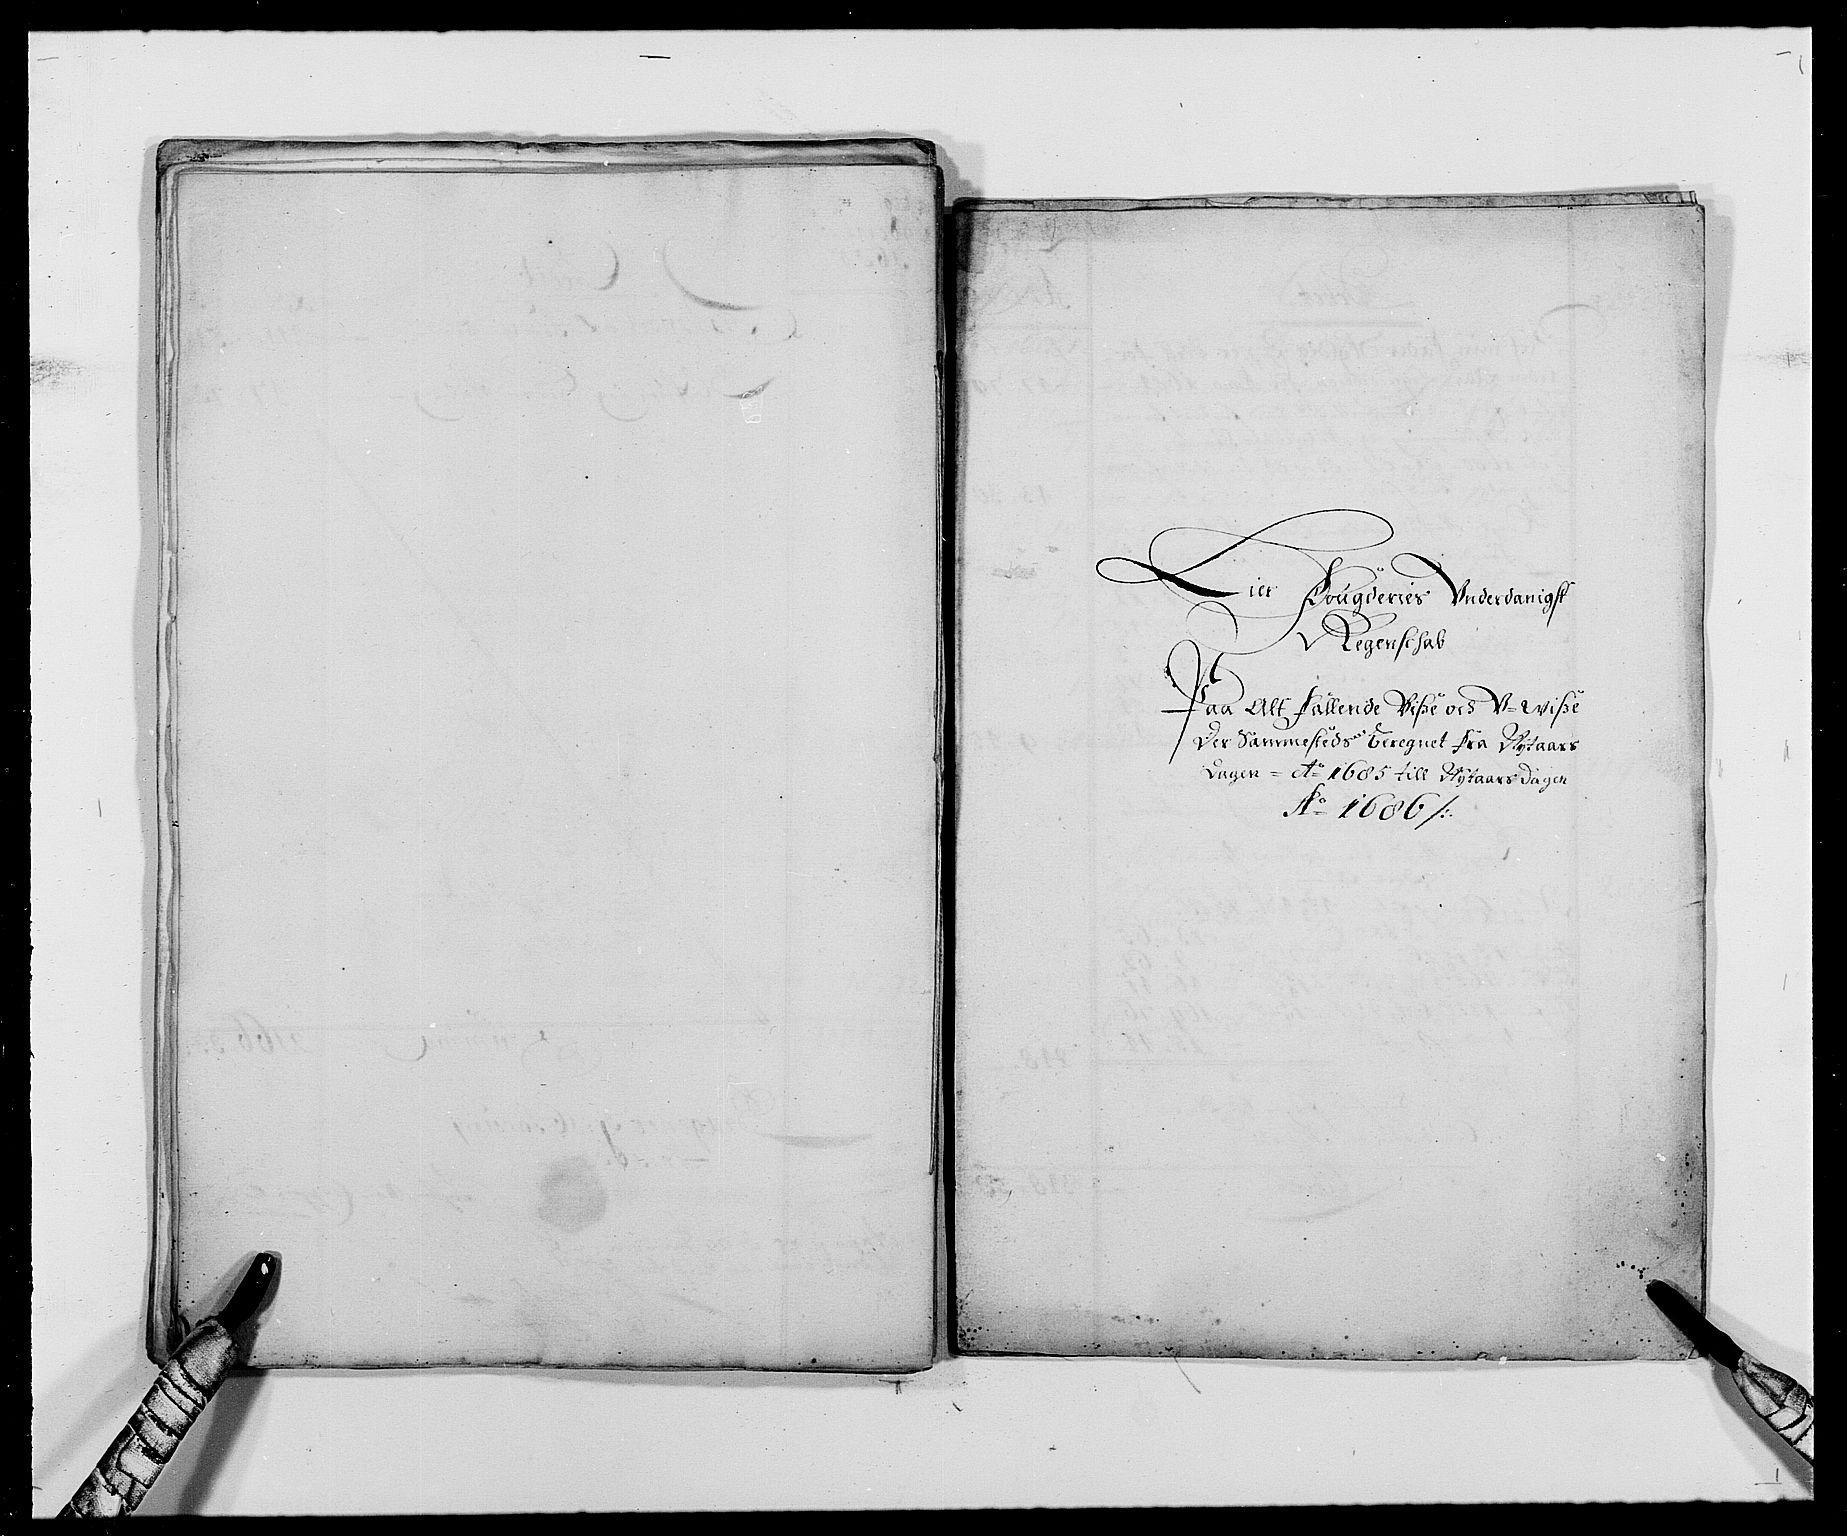 RA, Rentekammeret inntil 1814, Reviderte regnskaper, Fogderegnskap, R27/L1687: Fogderegnskap Lier, 1678-1686, s. 322